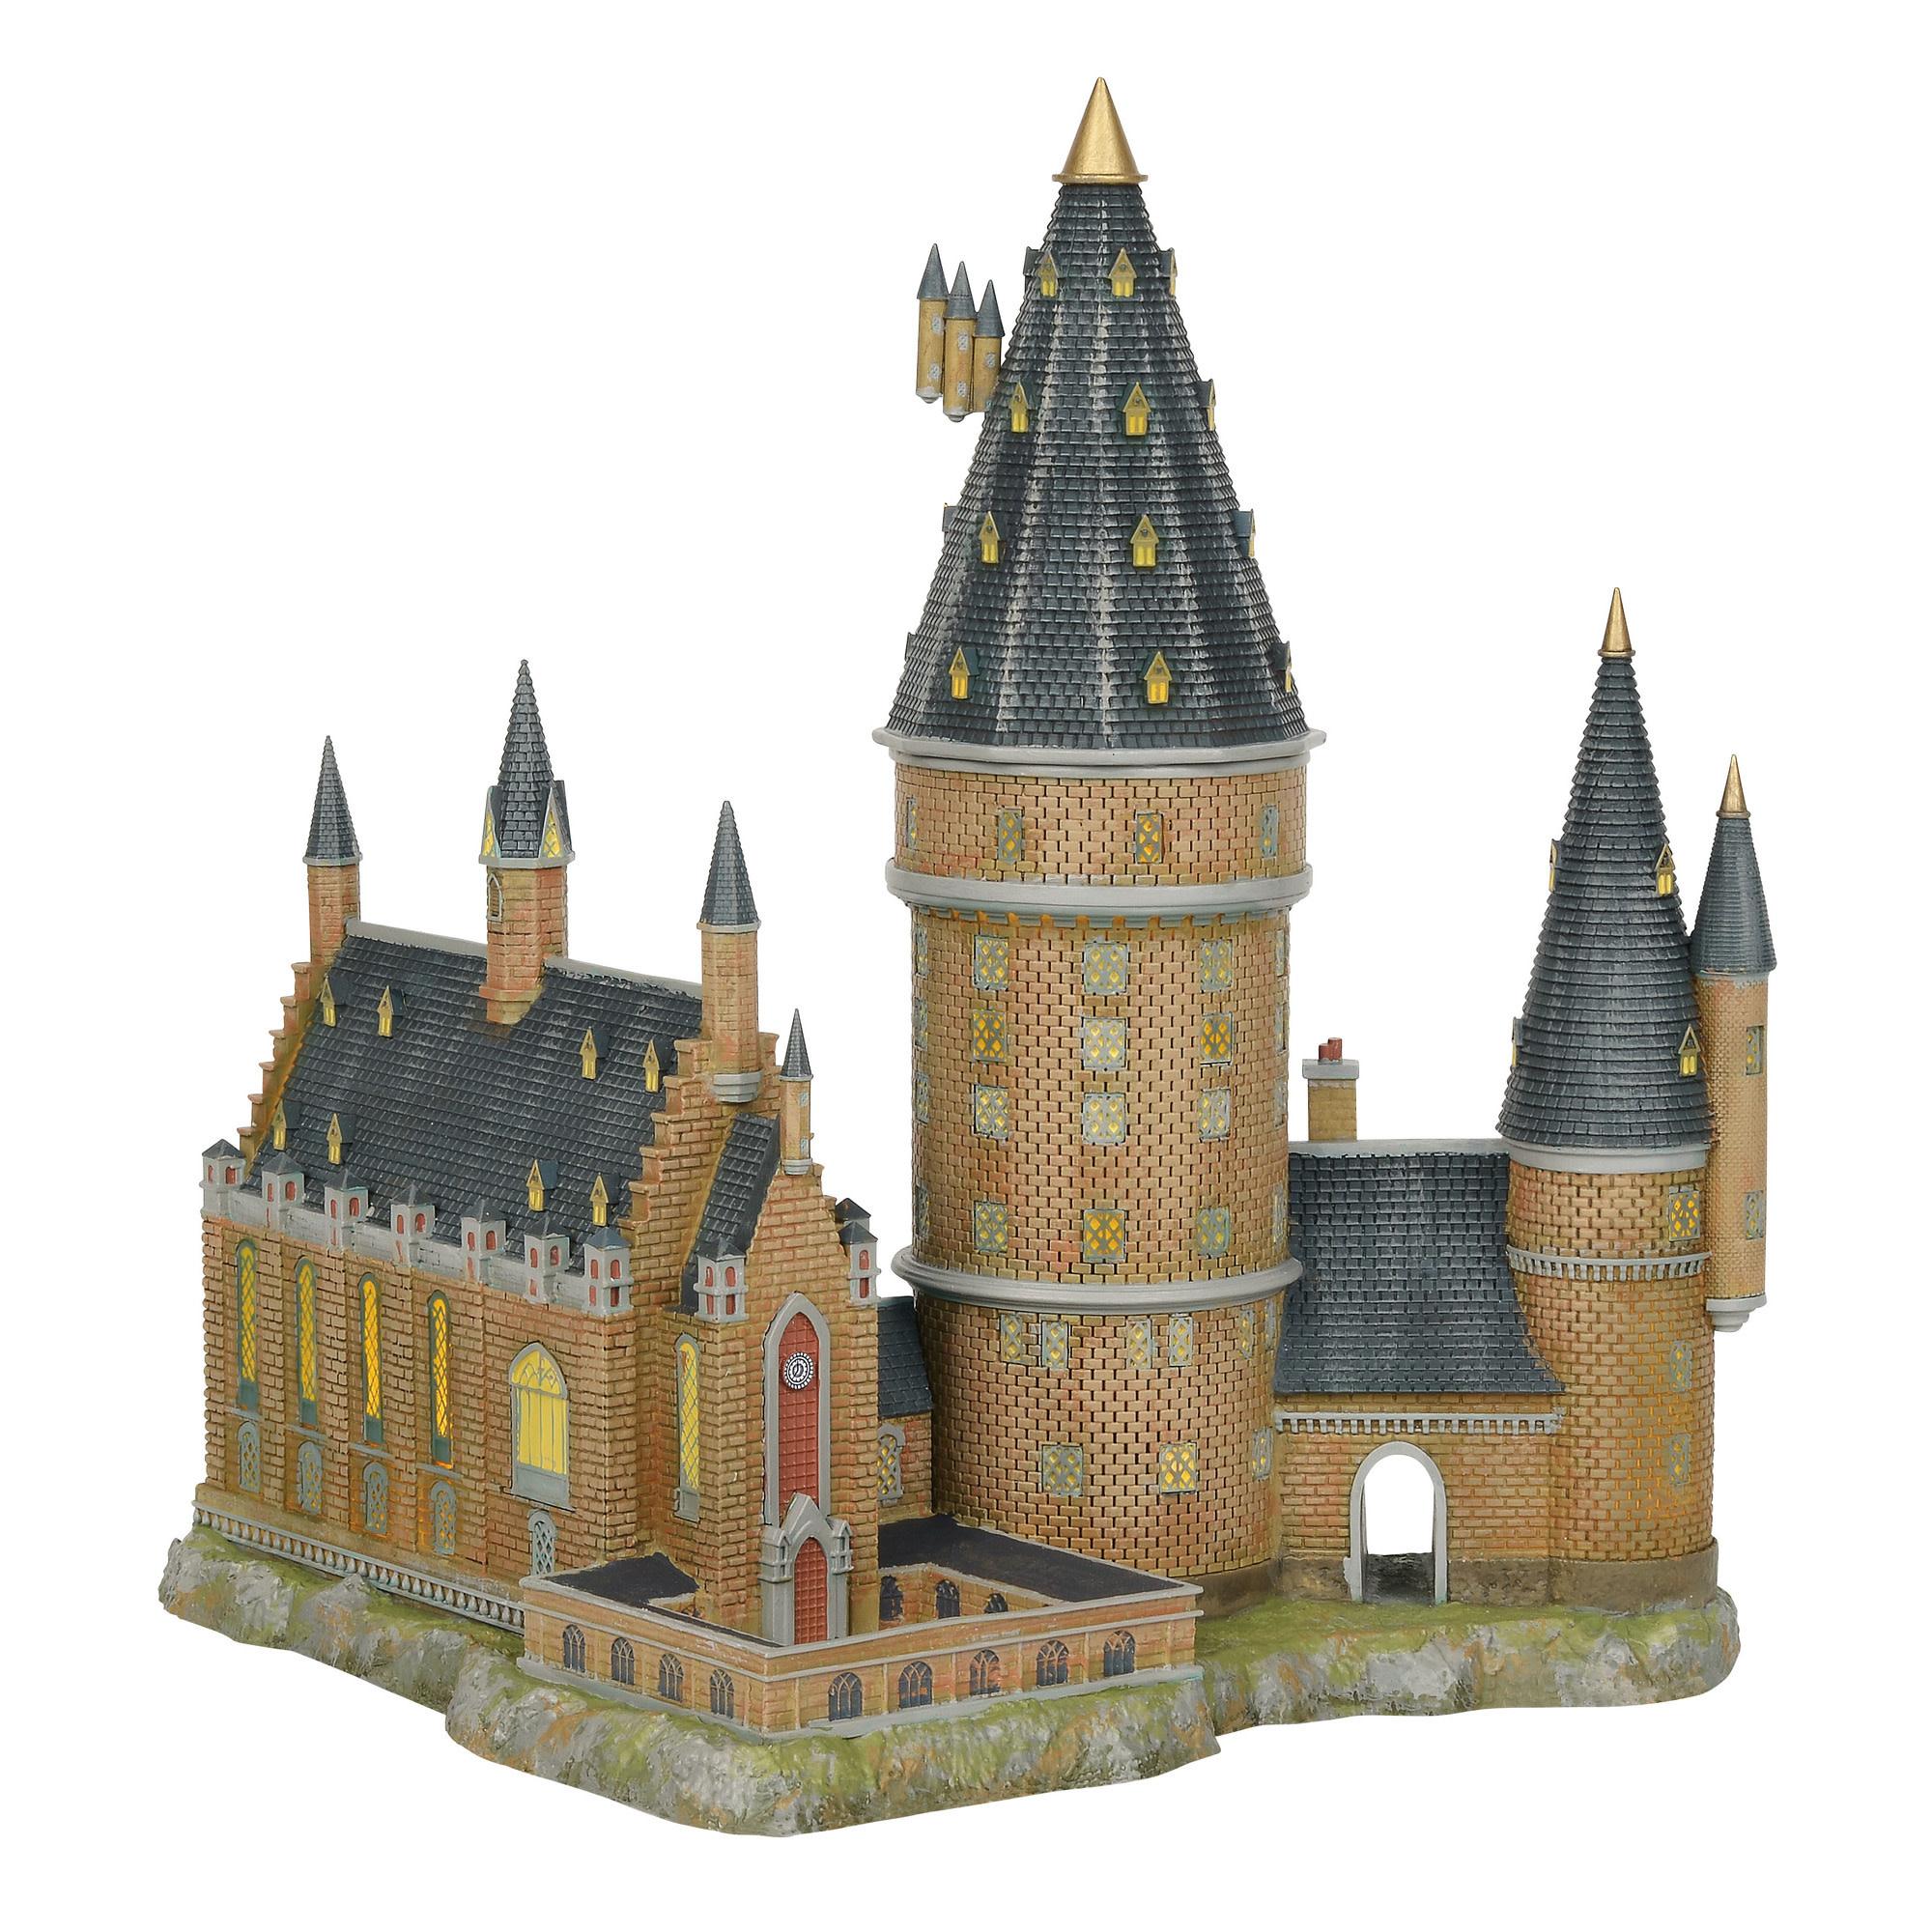 Department 56 Department 56 Harry Potter Village Hogwarts Great Hall